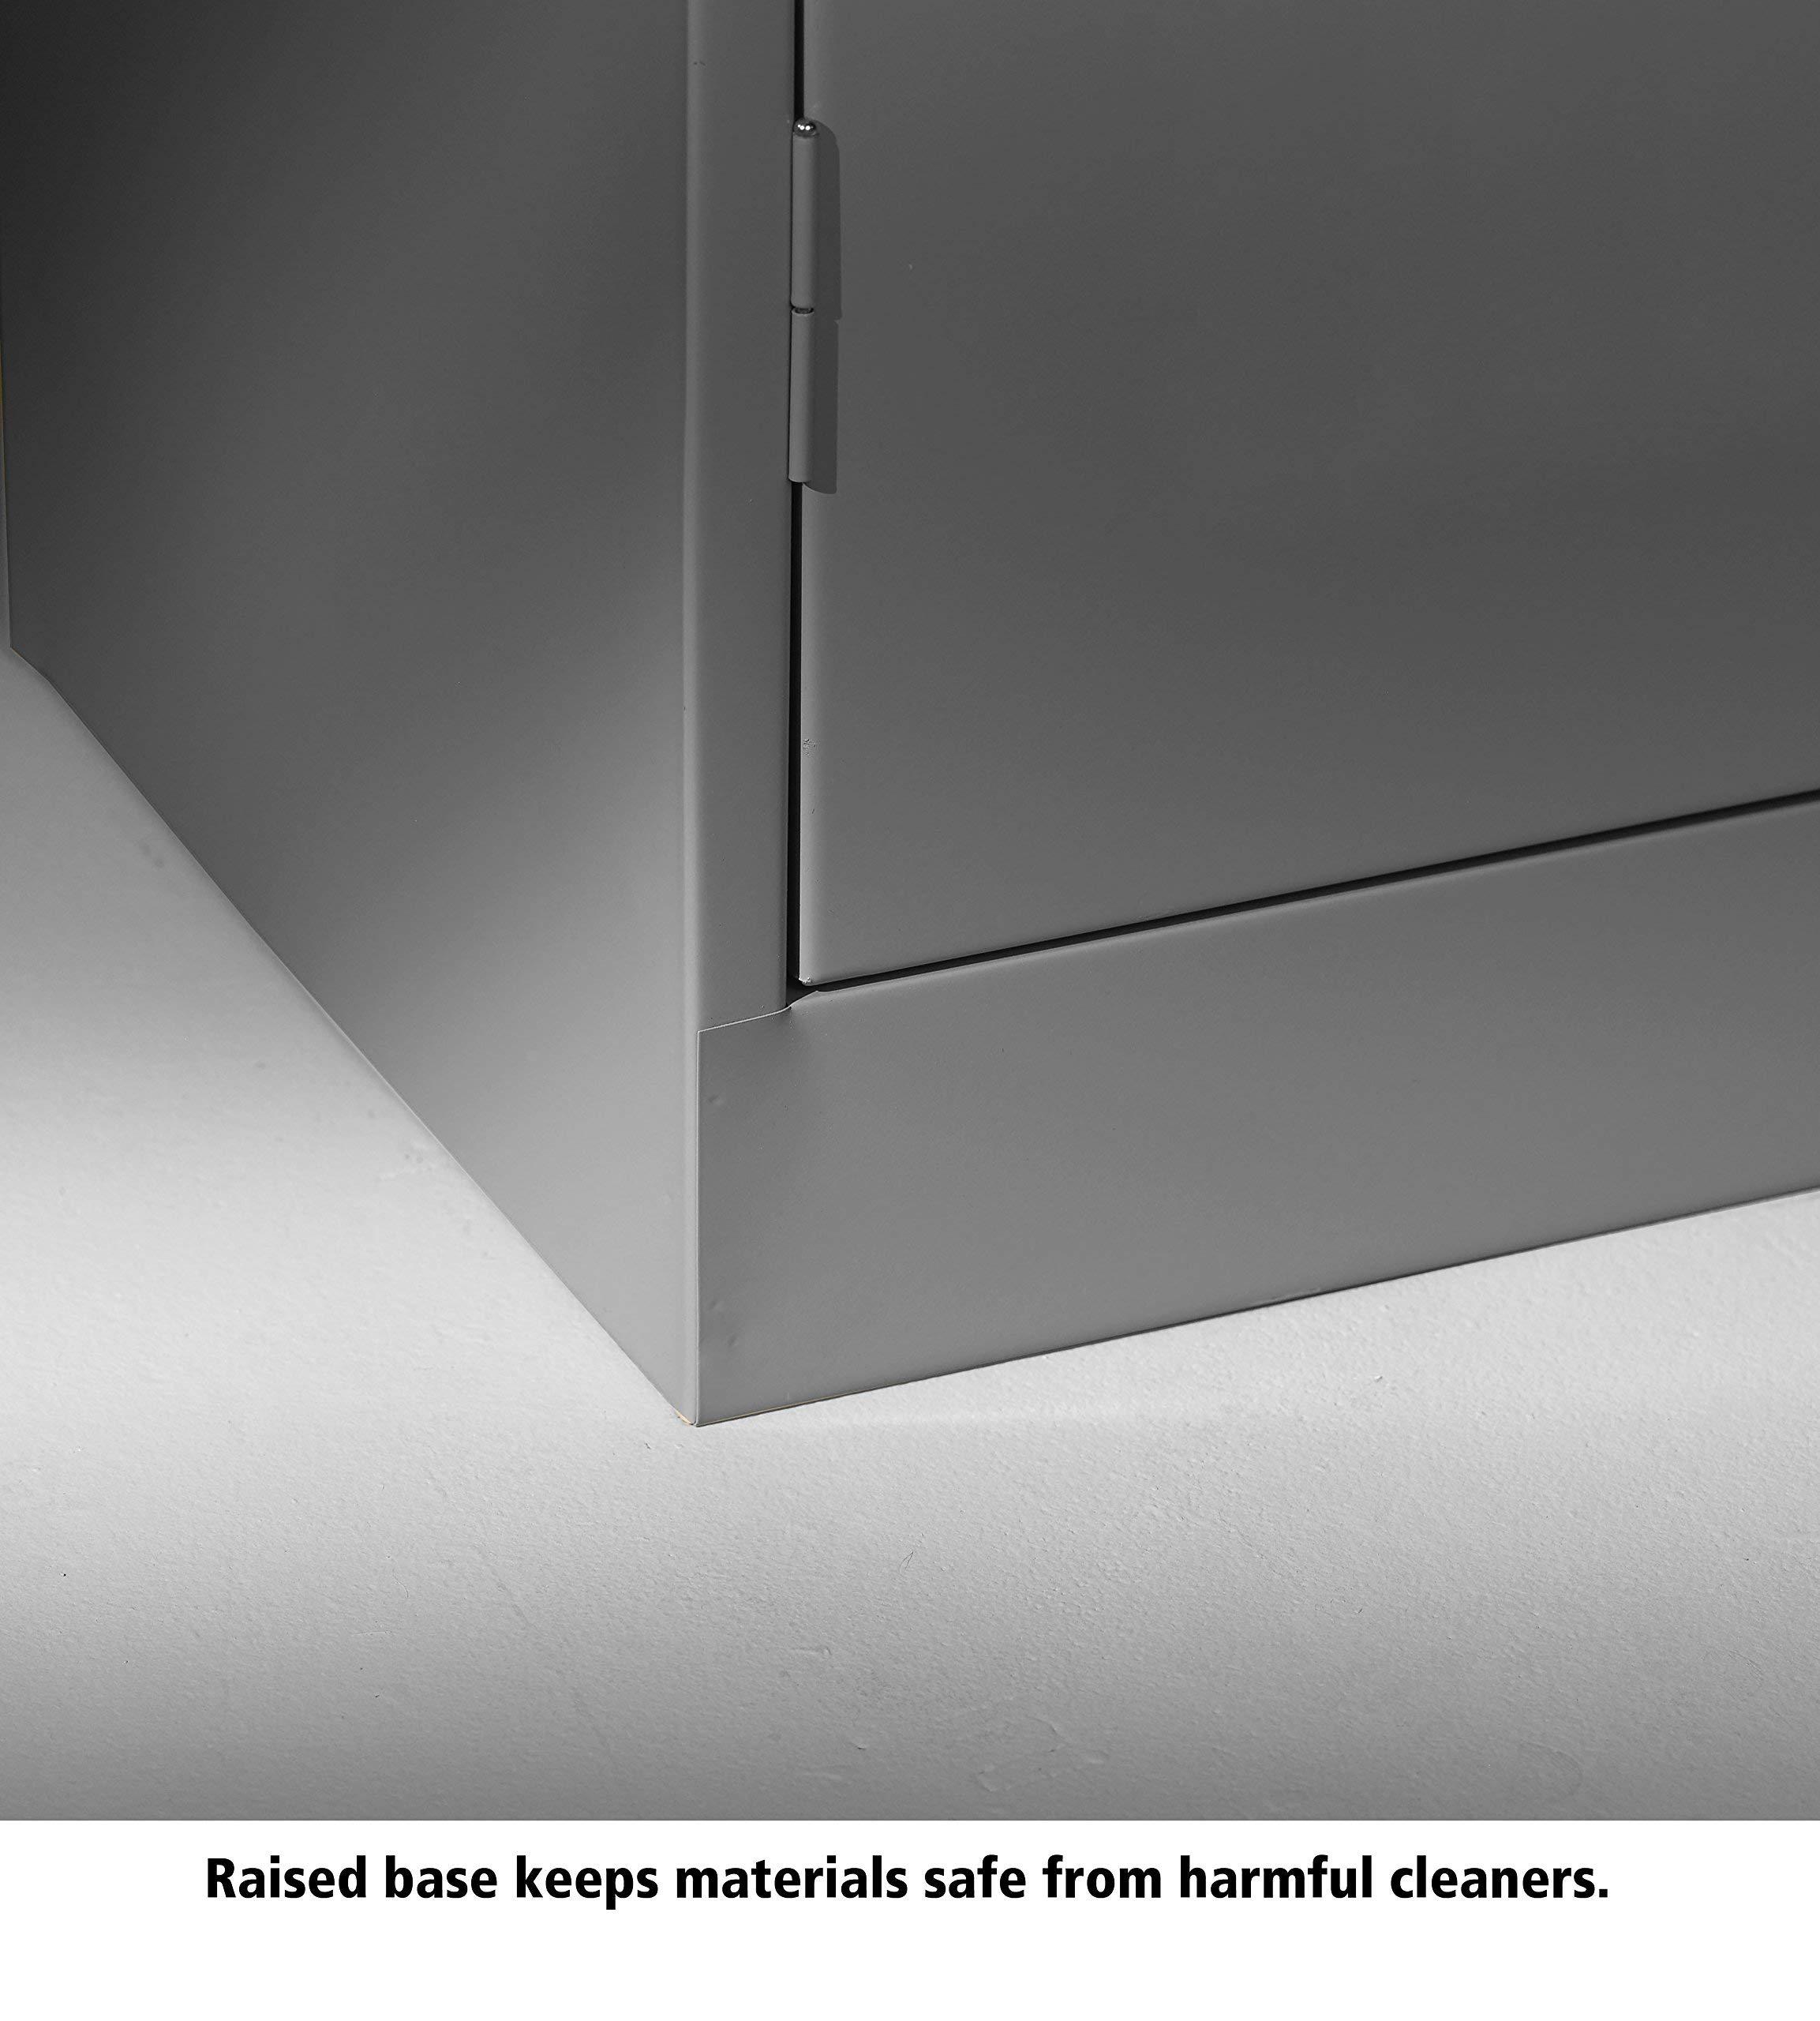 Tennsco 4218 24 Gauge Steel Standard Welded Counter High Cabinet, 2 Shelves, 150 lbs Capacity per Shelf, 36'' Width x 42'' Height x 18'' Depth, Black (Renewed) by Tennsco (Image #3)